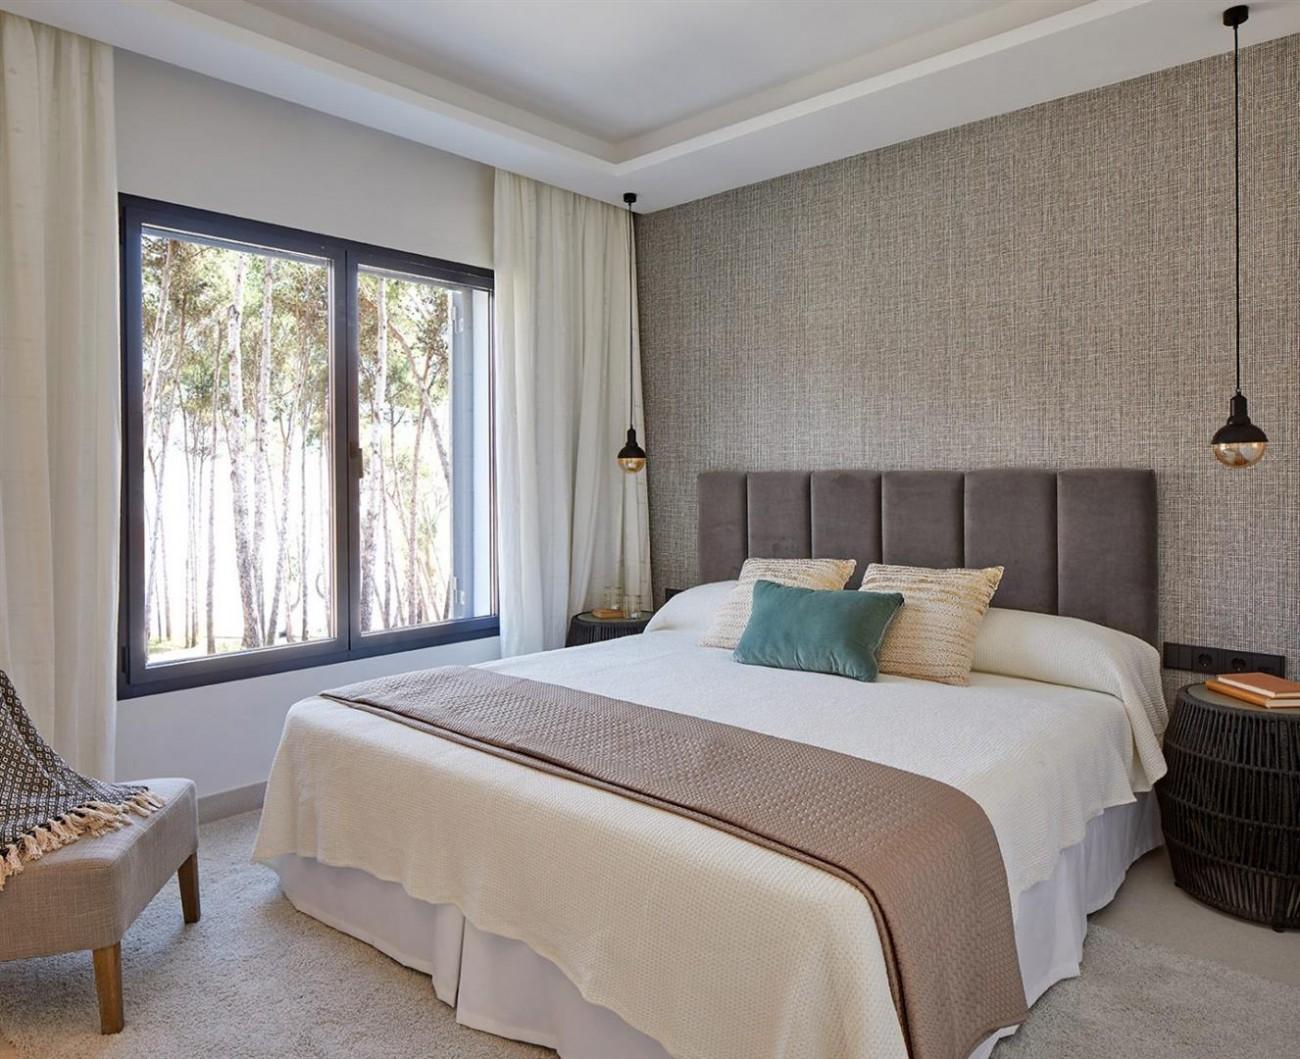 Frontline beach Luxury Townhouse Estepona Spain (9) (Large)